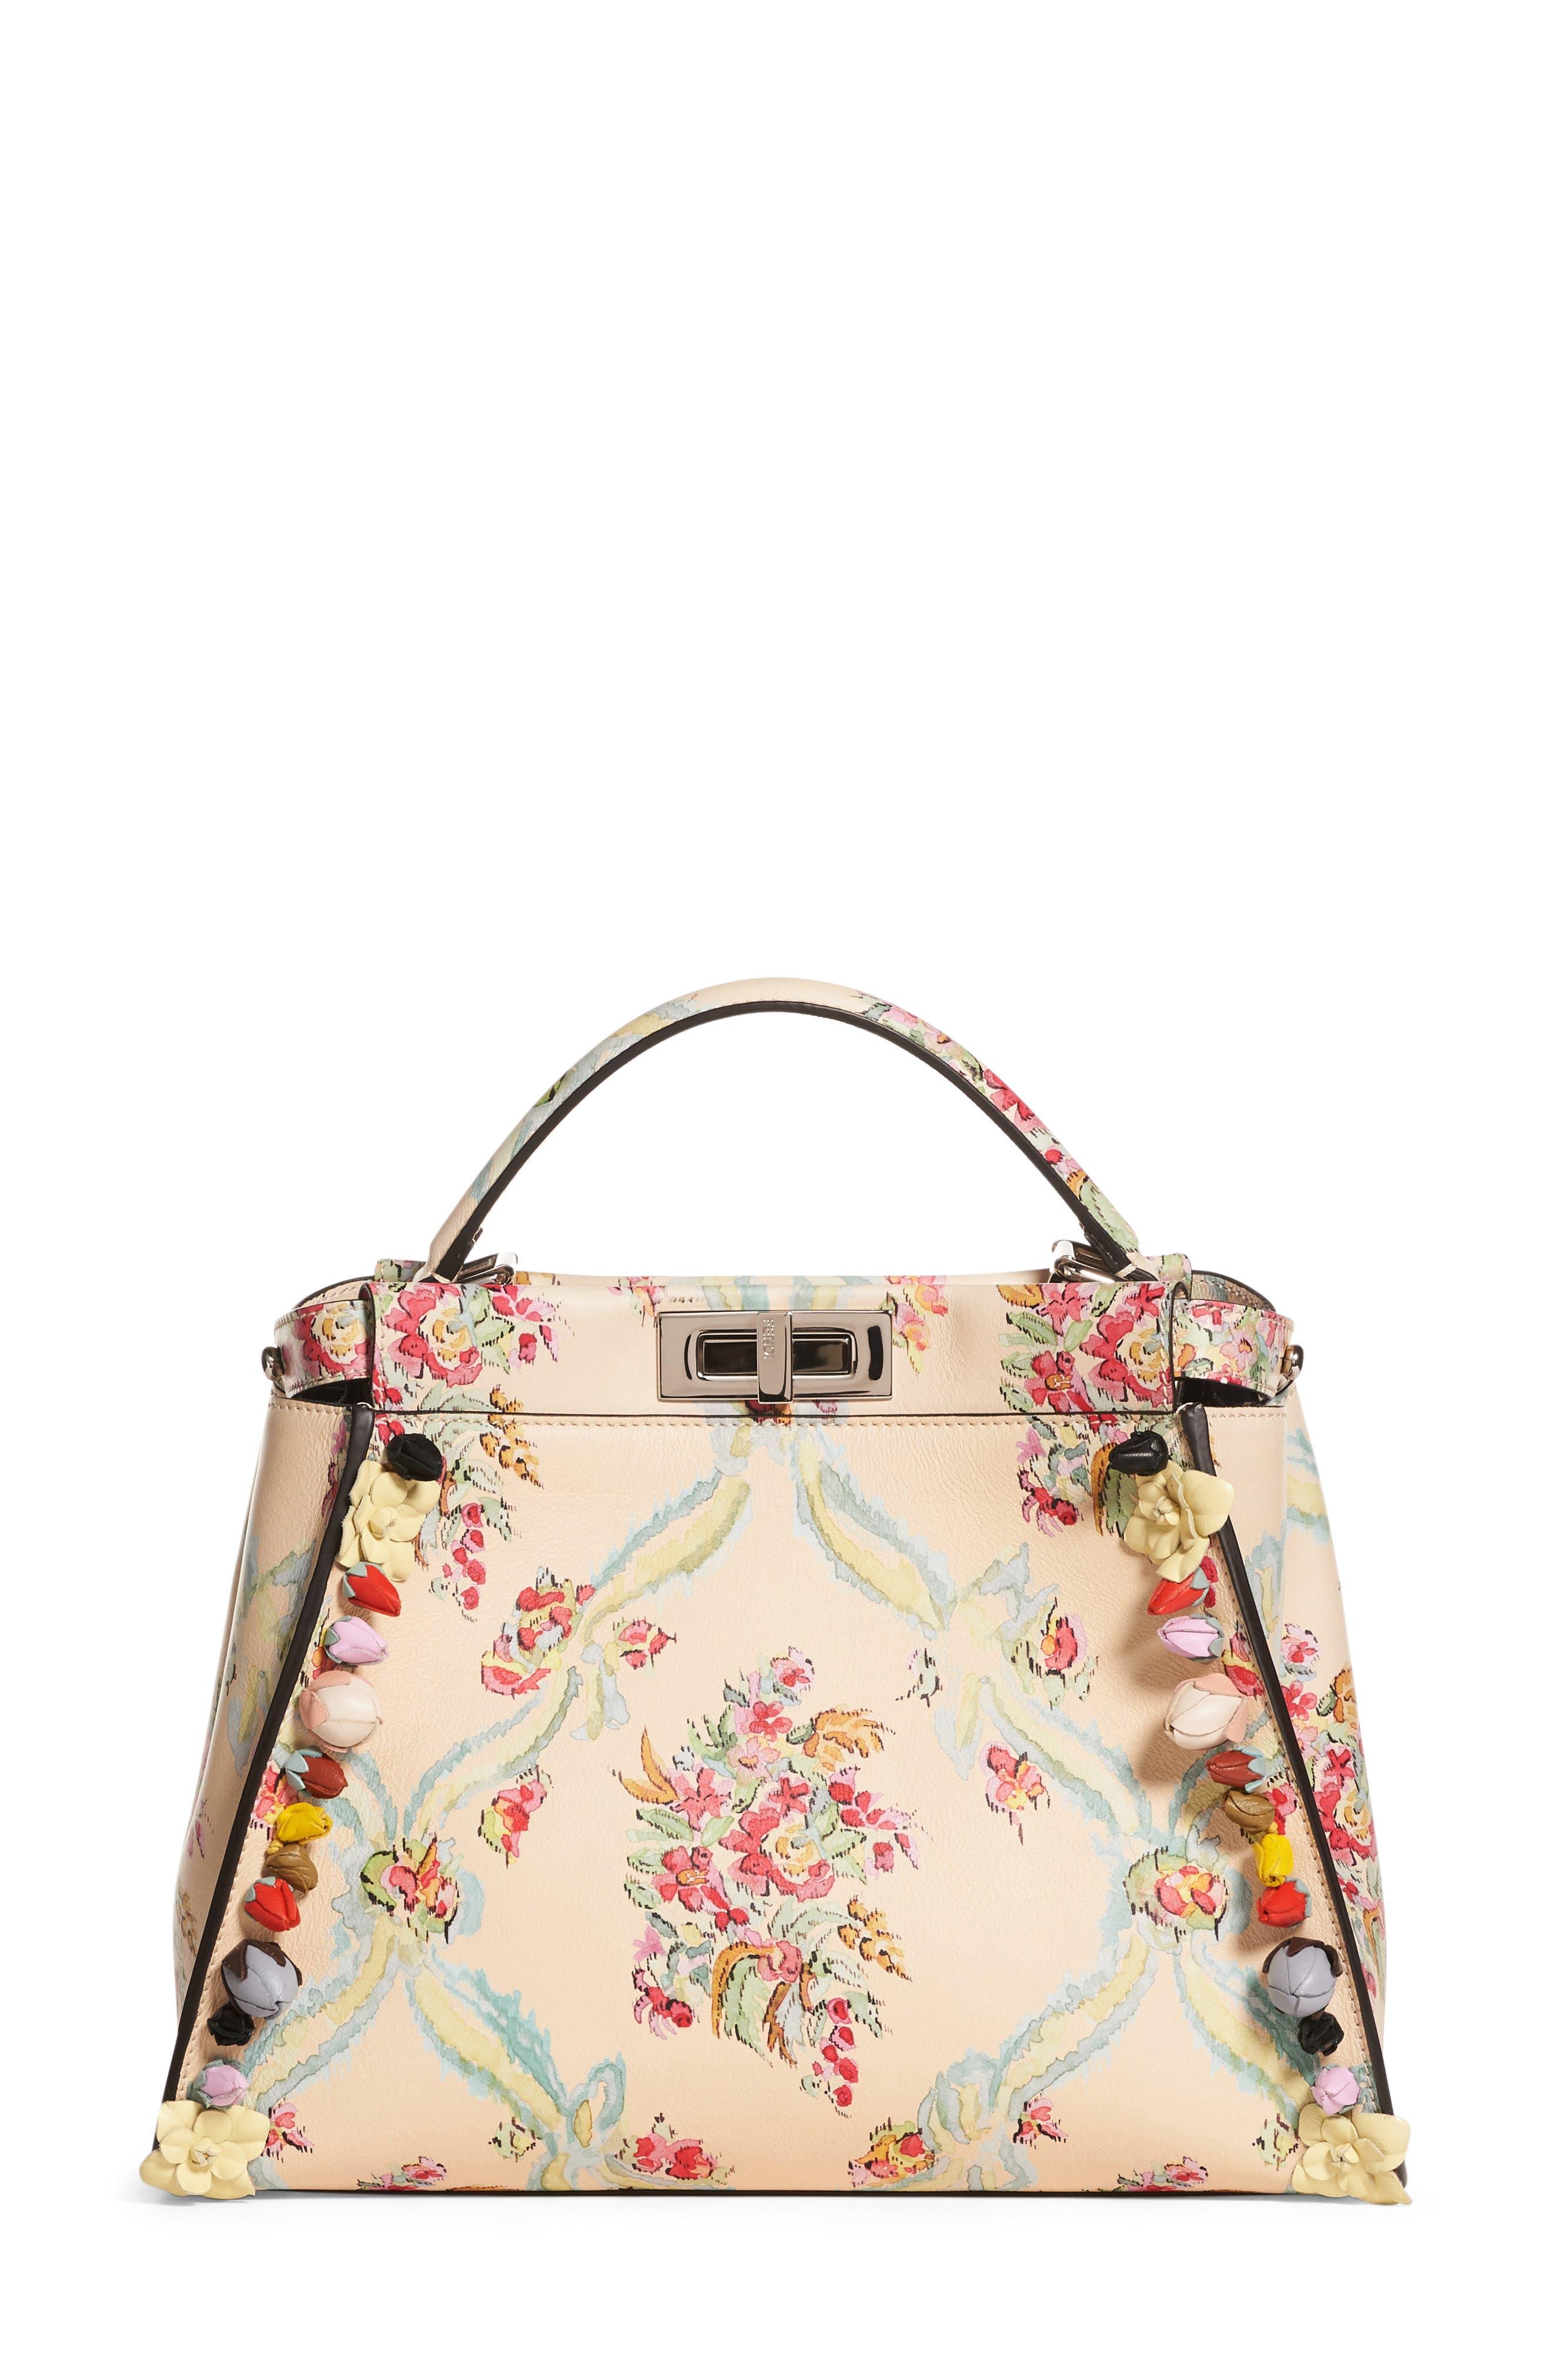 Main Image - Fendi Medium Peekaboo Floral Appliqué Leather Satchel